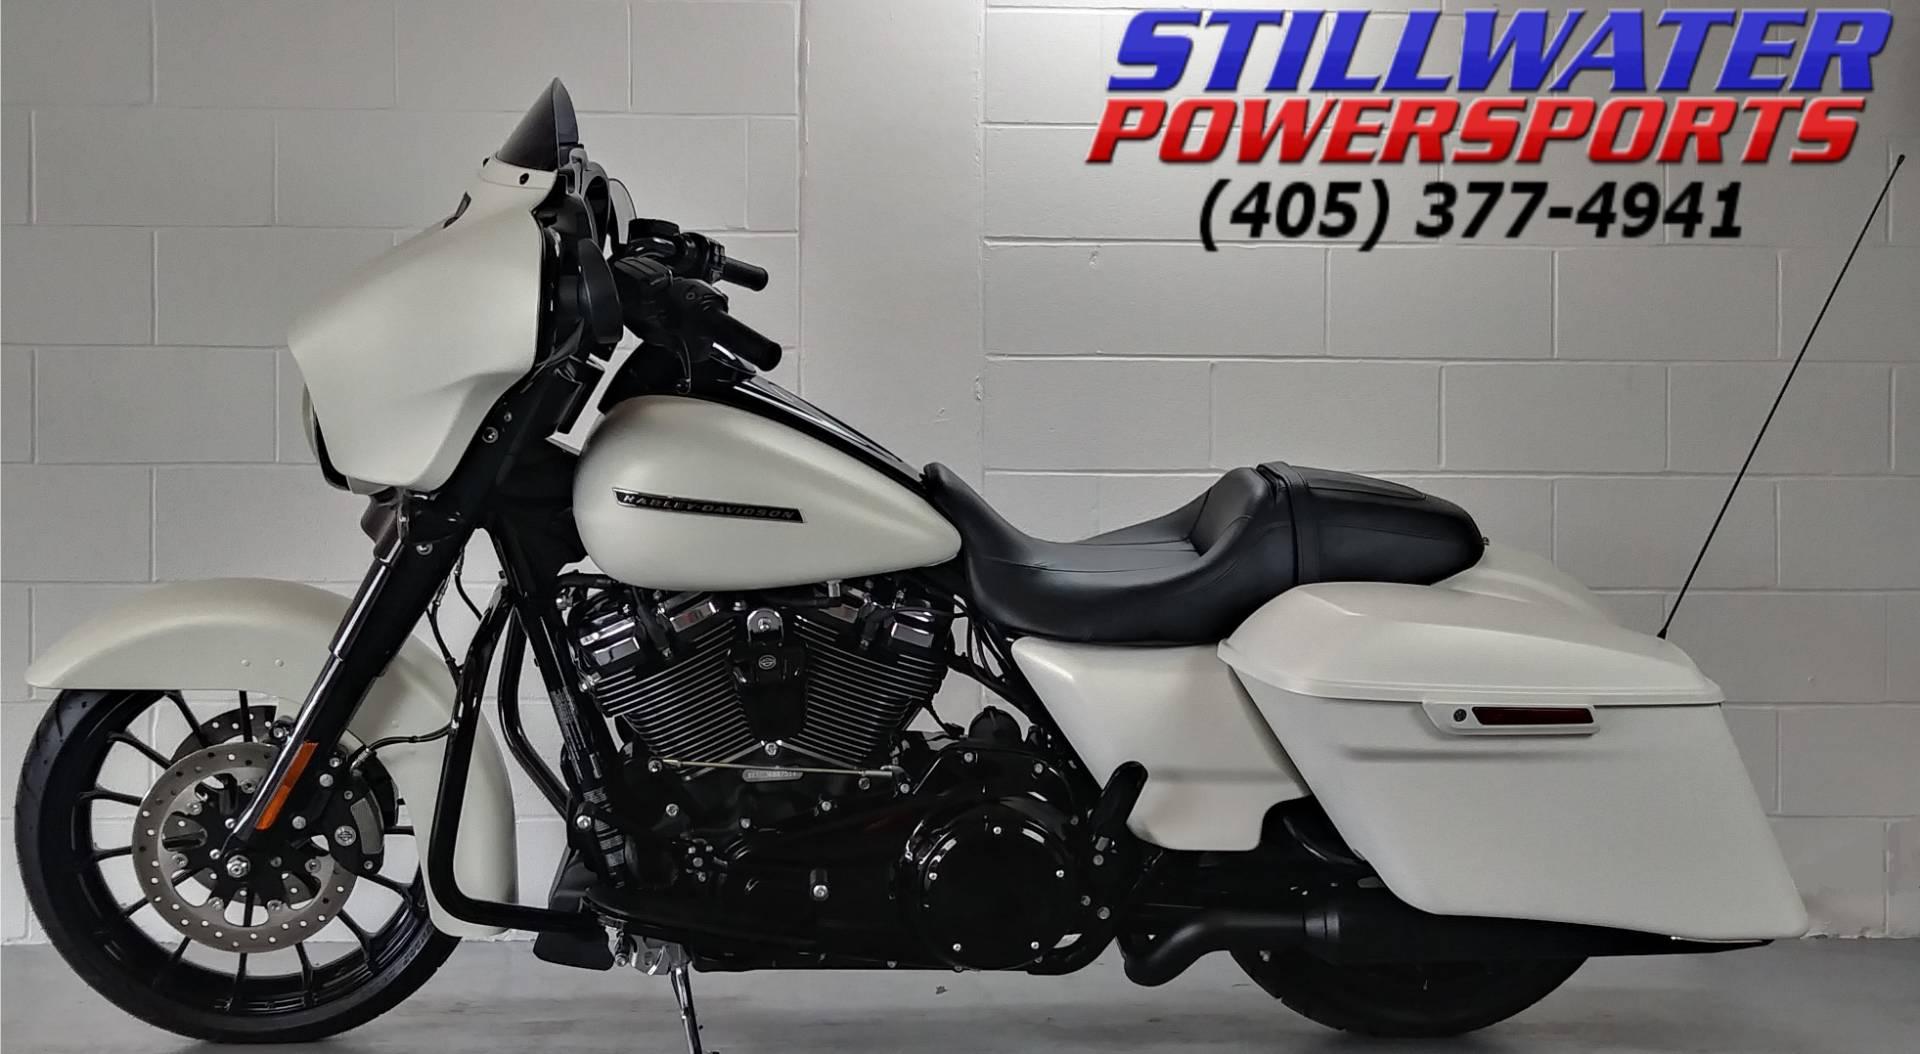 2018 Harley-Davidson Street Glide in Stillwater, Oklahoma